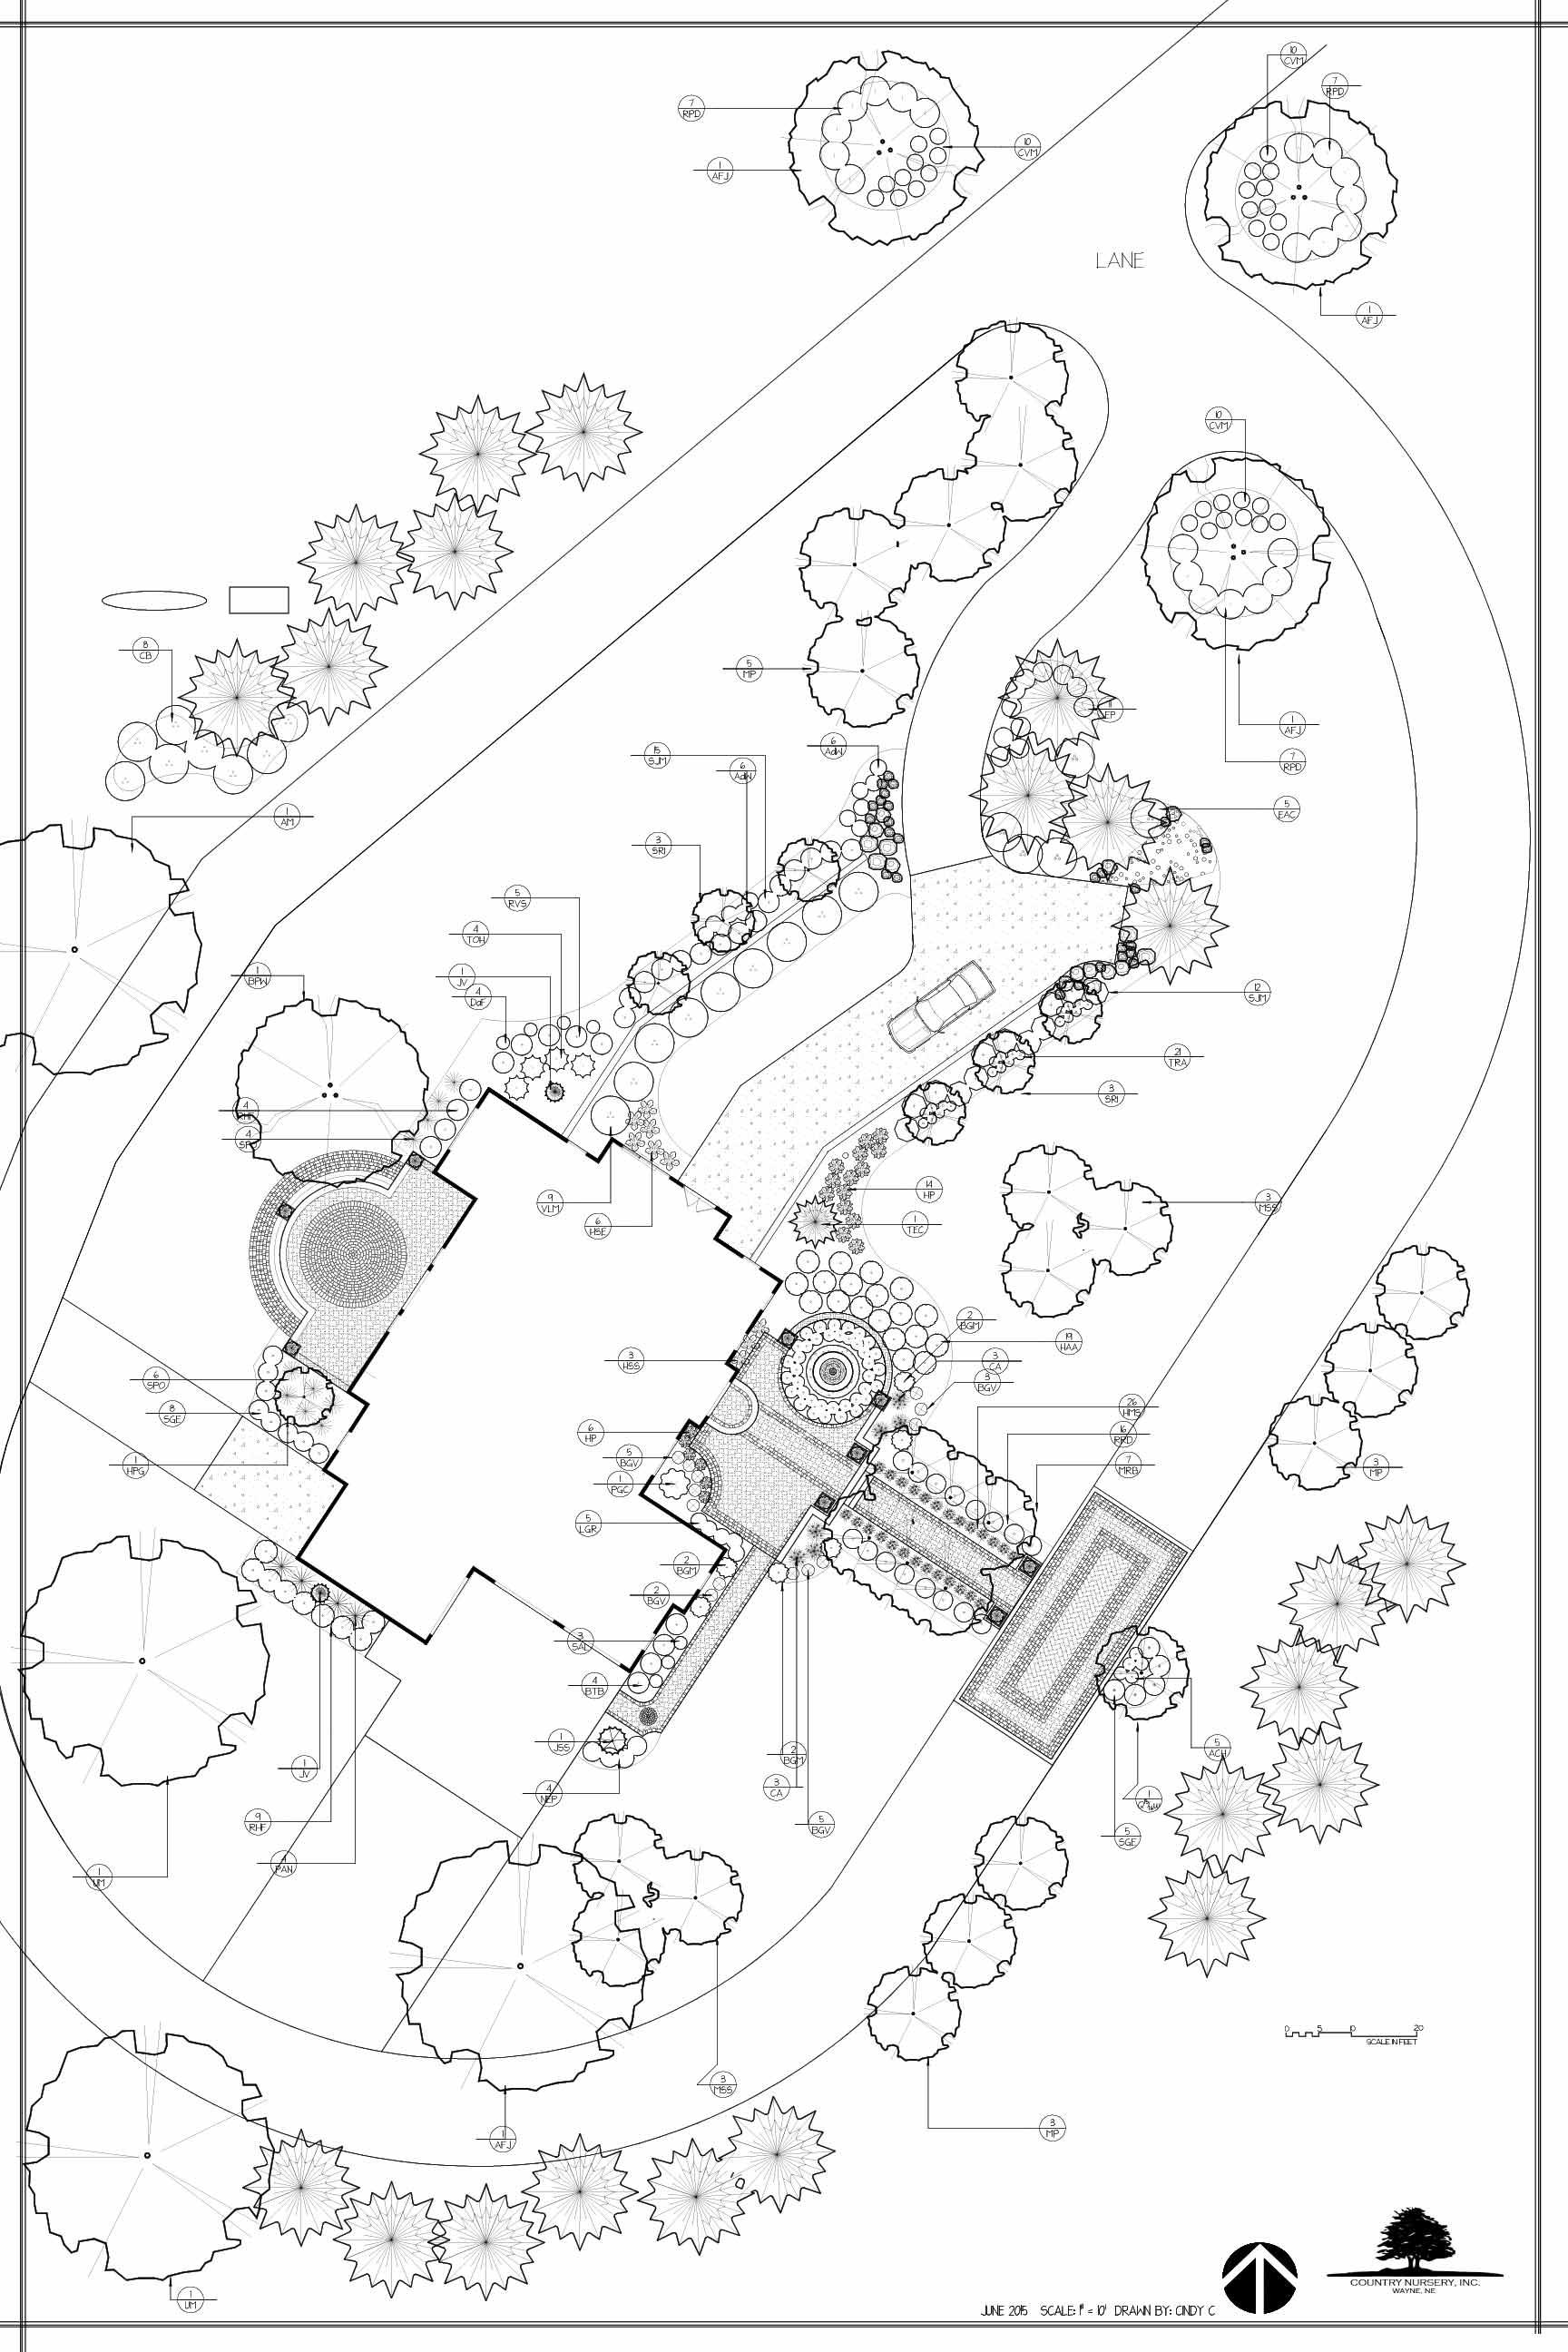 Landscape designs country nursery wayne ne blueprints landscaping designs architecture malvernweather Image collections